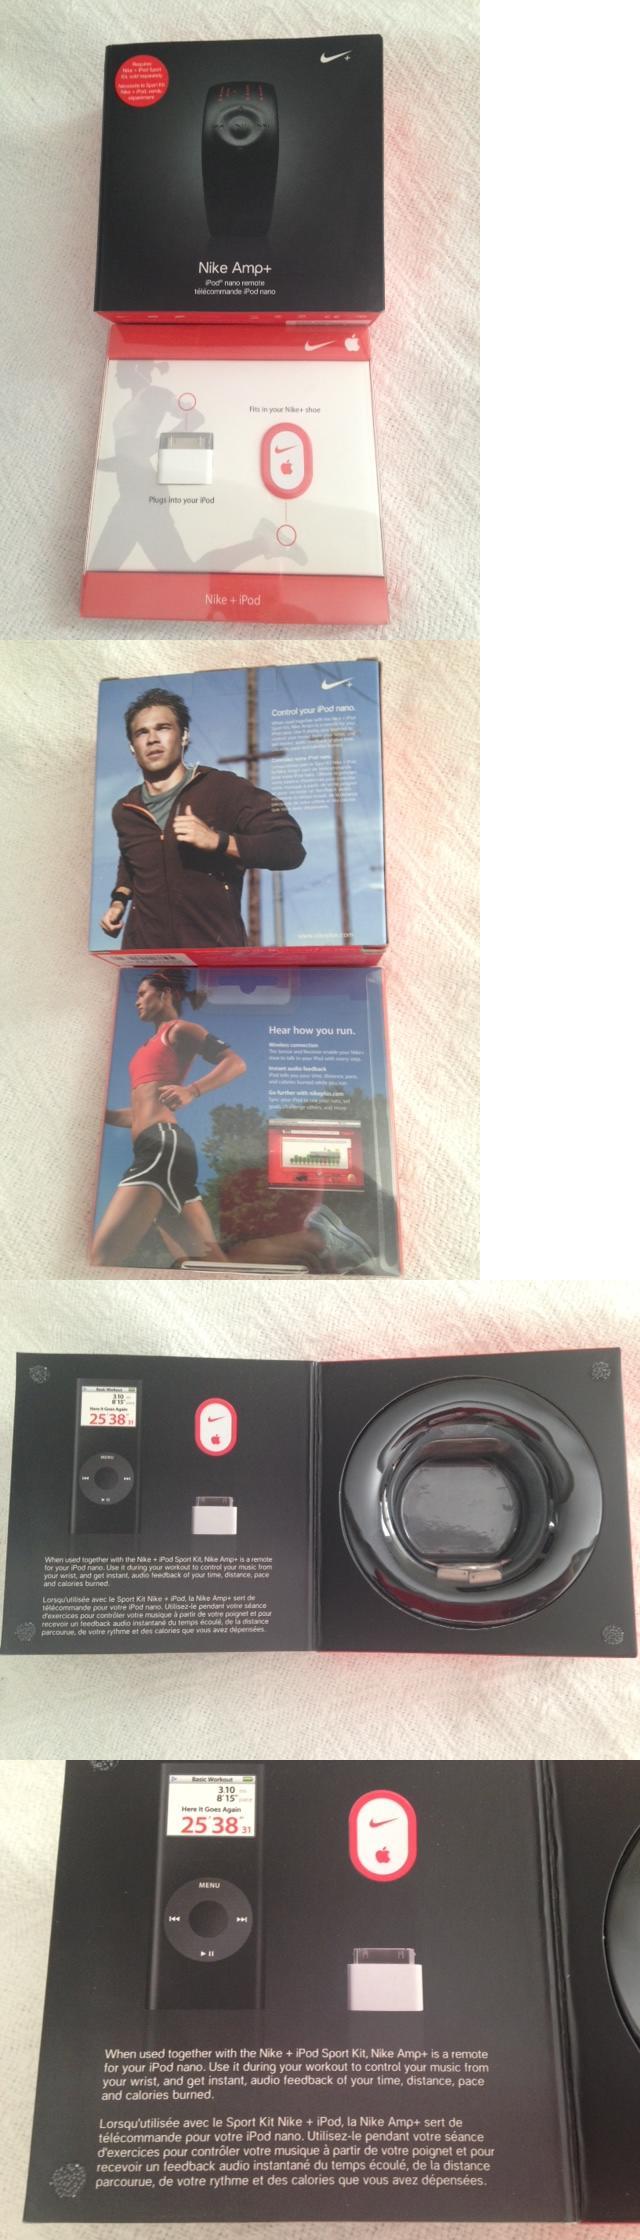 Other iPod and Audio Player Accs: Nike Amp+ Ipod Nano Remote Watch  Wristwatch W Box